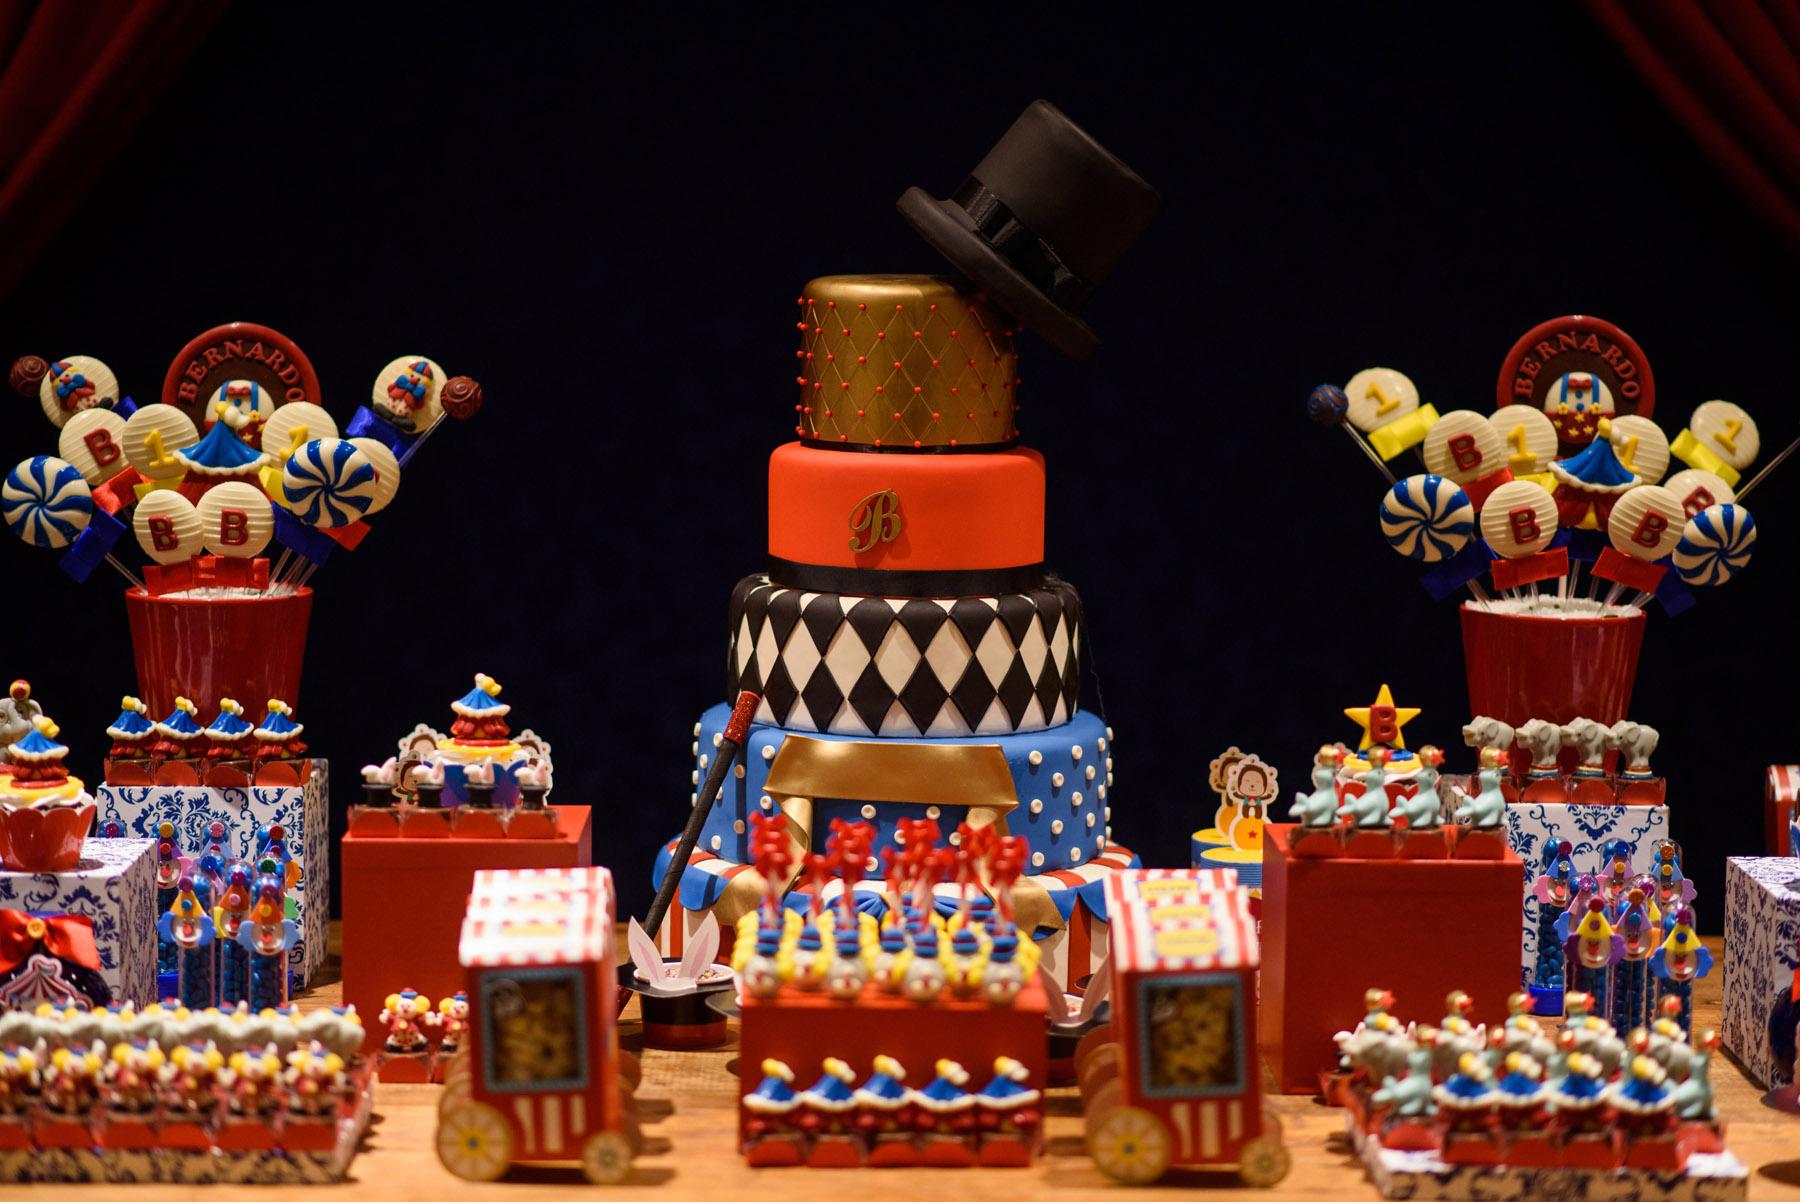 06-festa-infantil-curitiba-mundokids-festade1ano-tema-circo-guswanderley.jpg